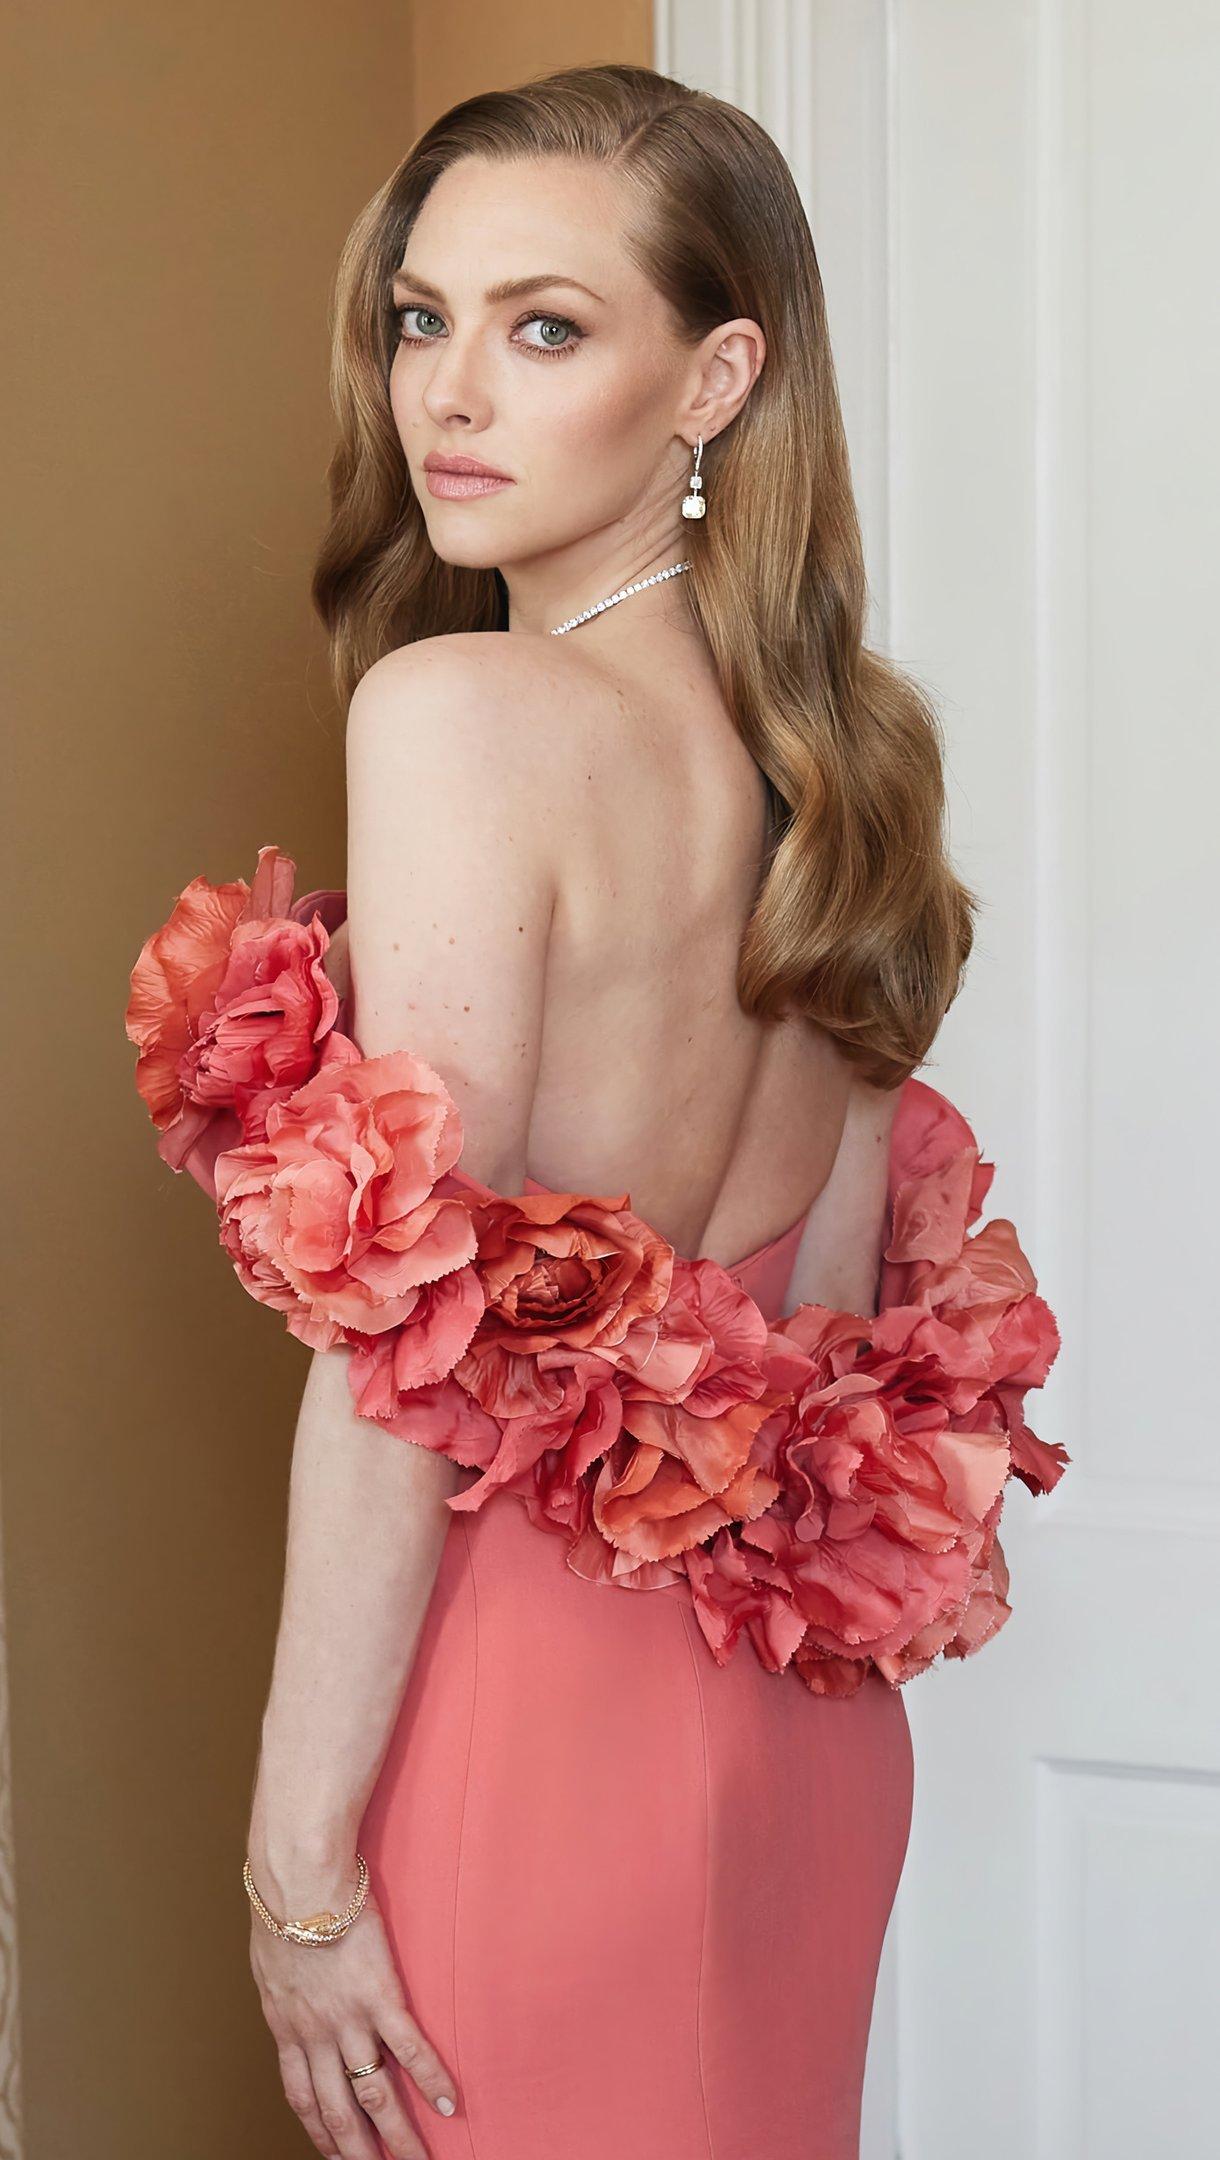 Fondos de pantalla Amanda Seyfried vestido rosa Vertical